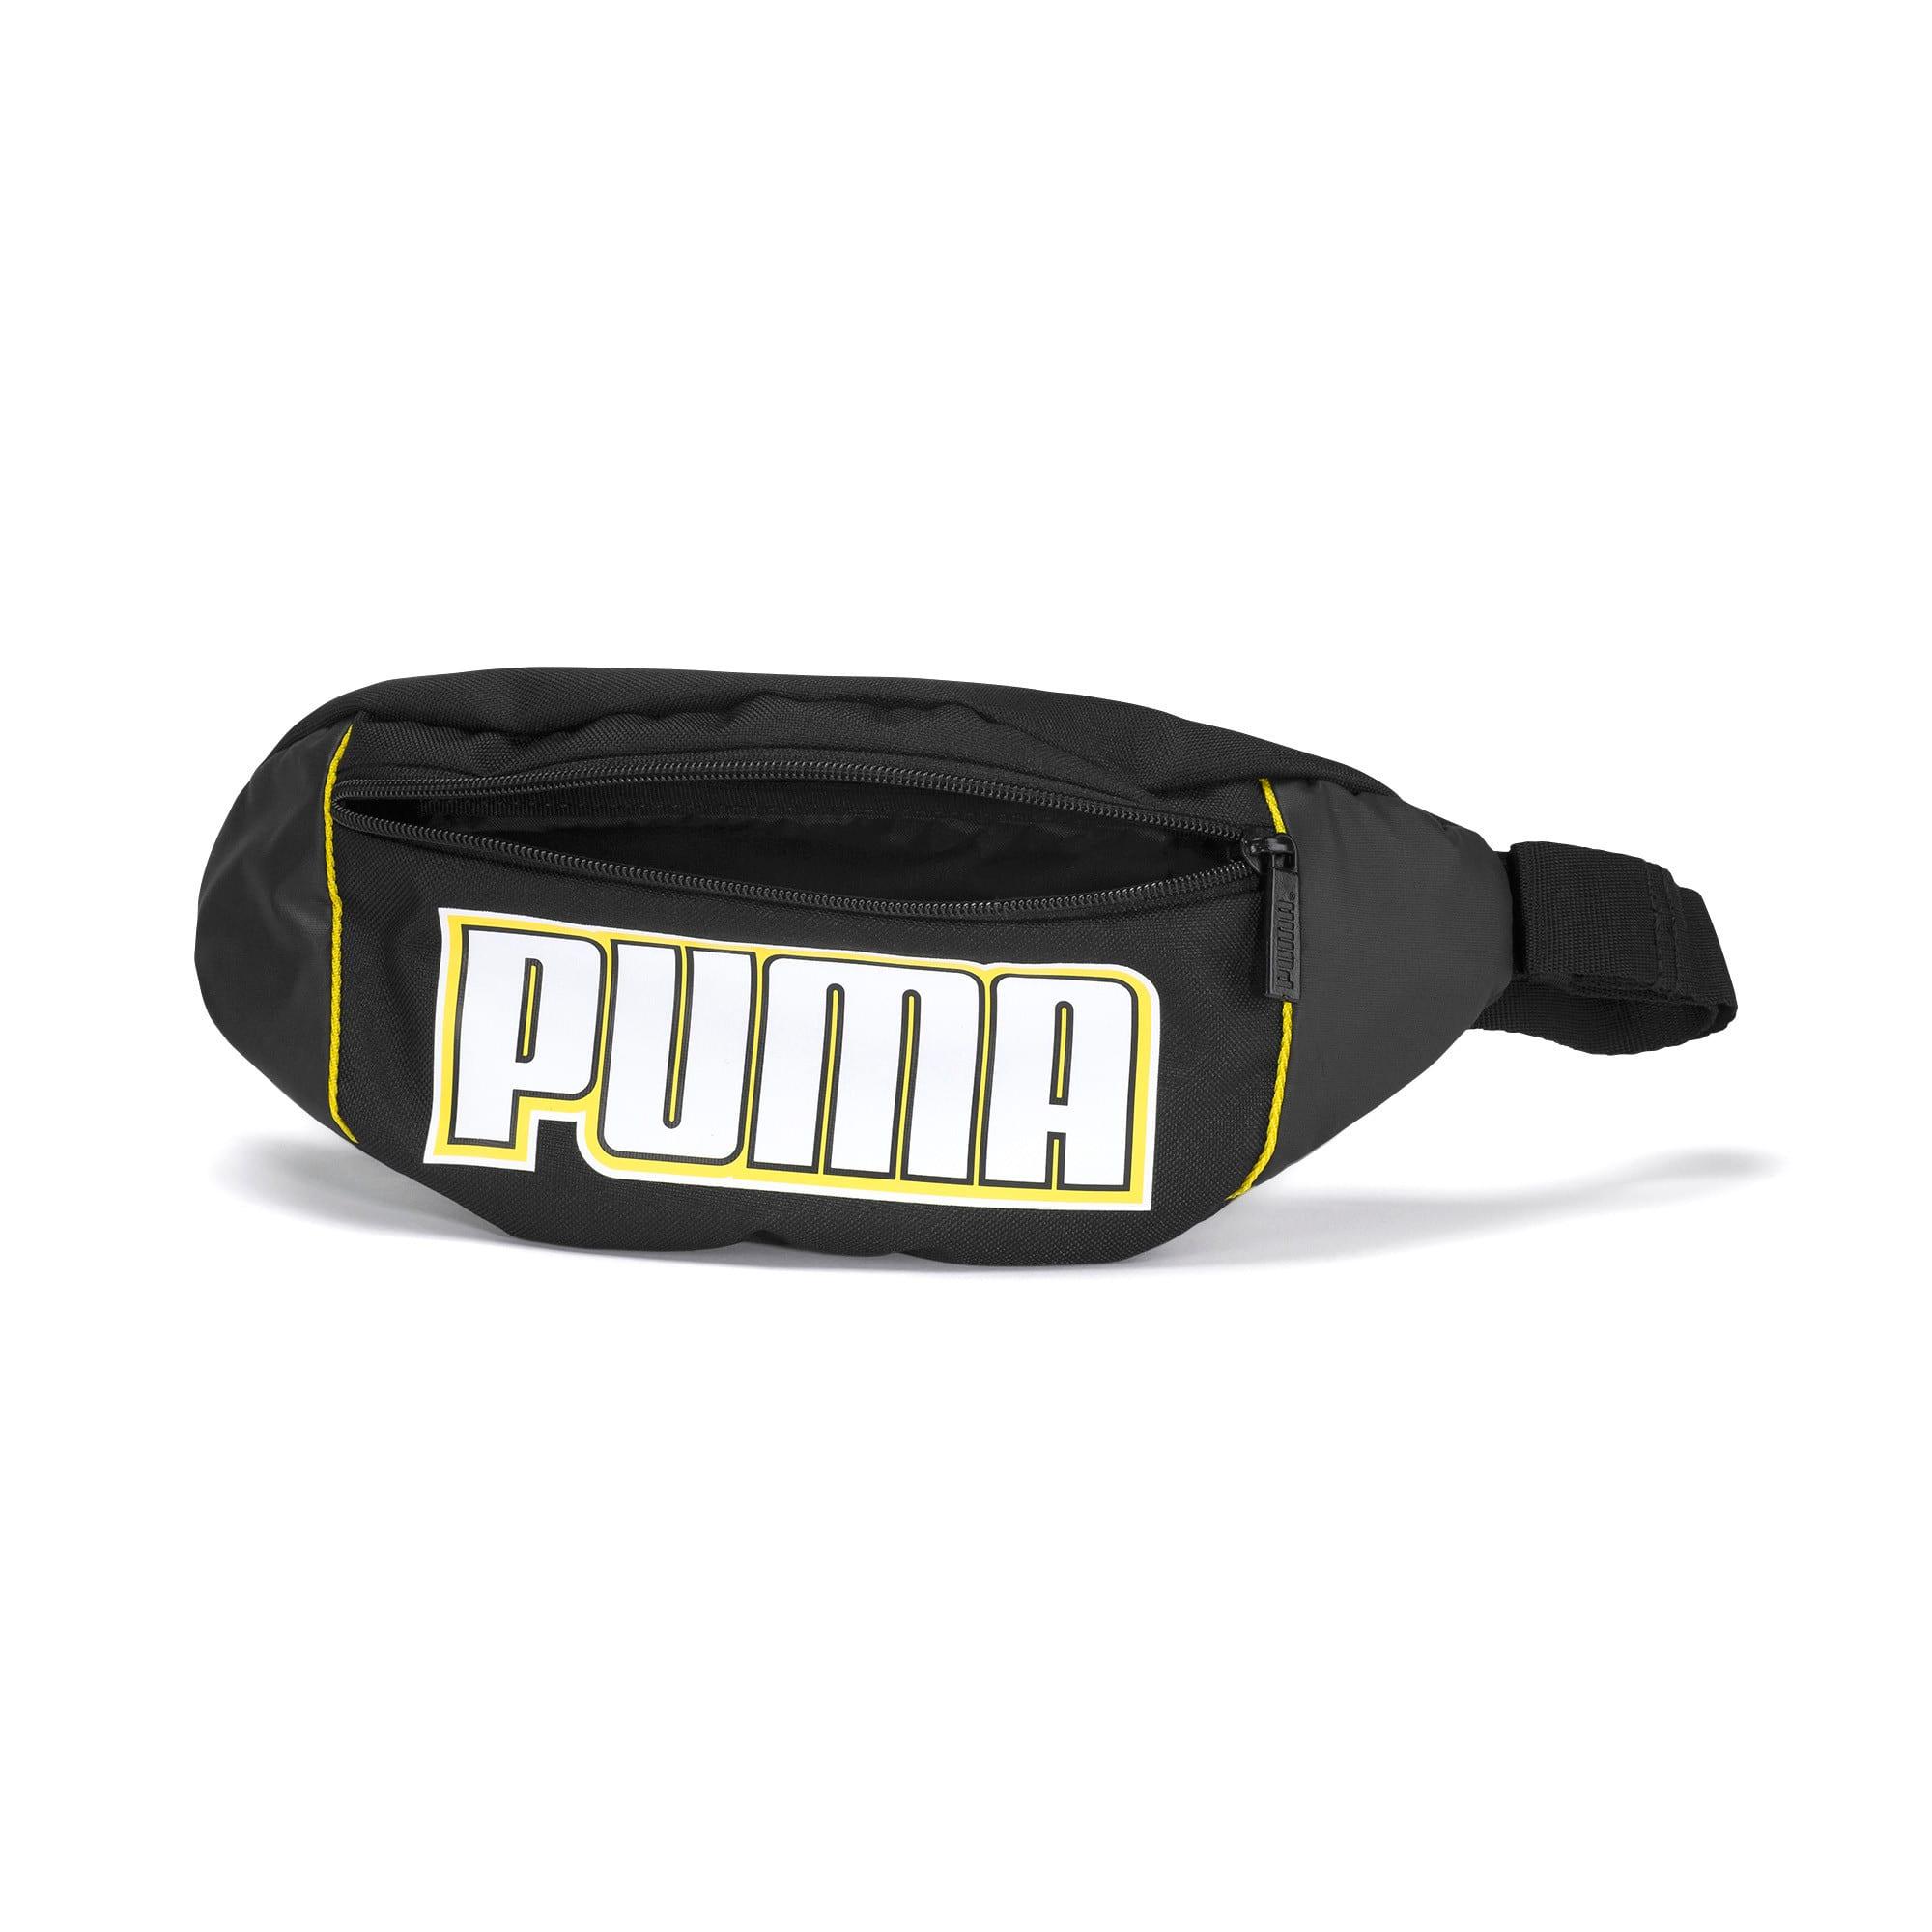 Thumbnail 3 of Women's Core Now Waist Bag, Puma Black, medium